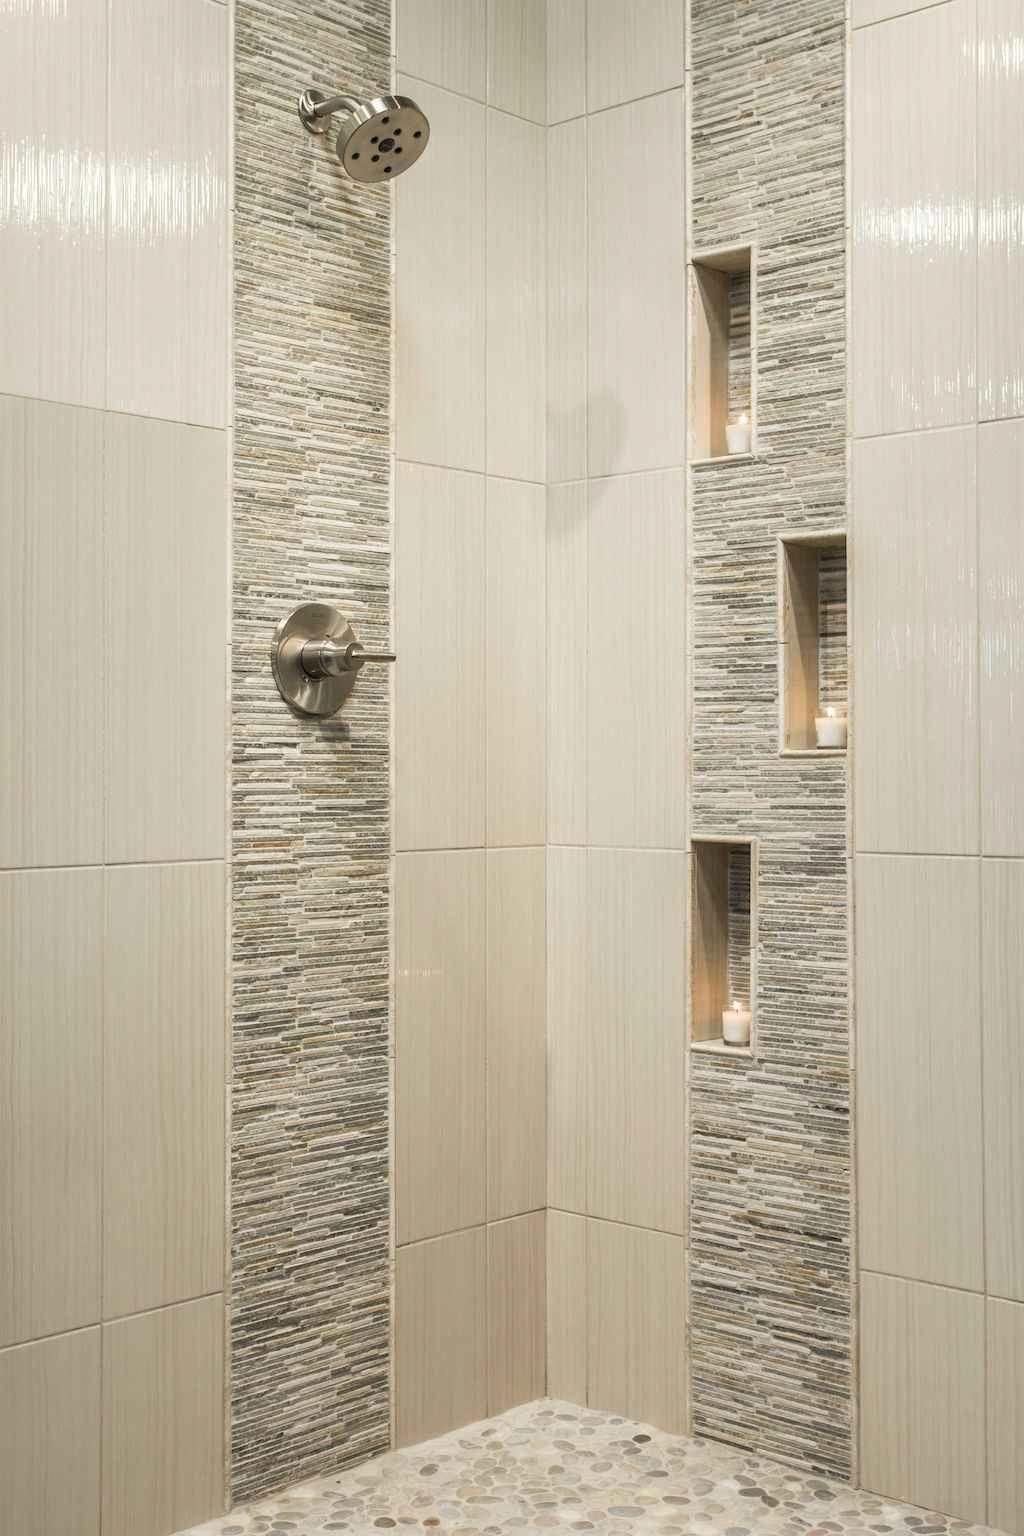 Minimalist Bathroom Concrete Bathroomcolorsplum Modern Bathroom Tile Unique Bathroom Tiles Small Bathroom Tiles Latest full bathroom wall